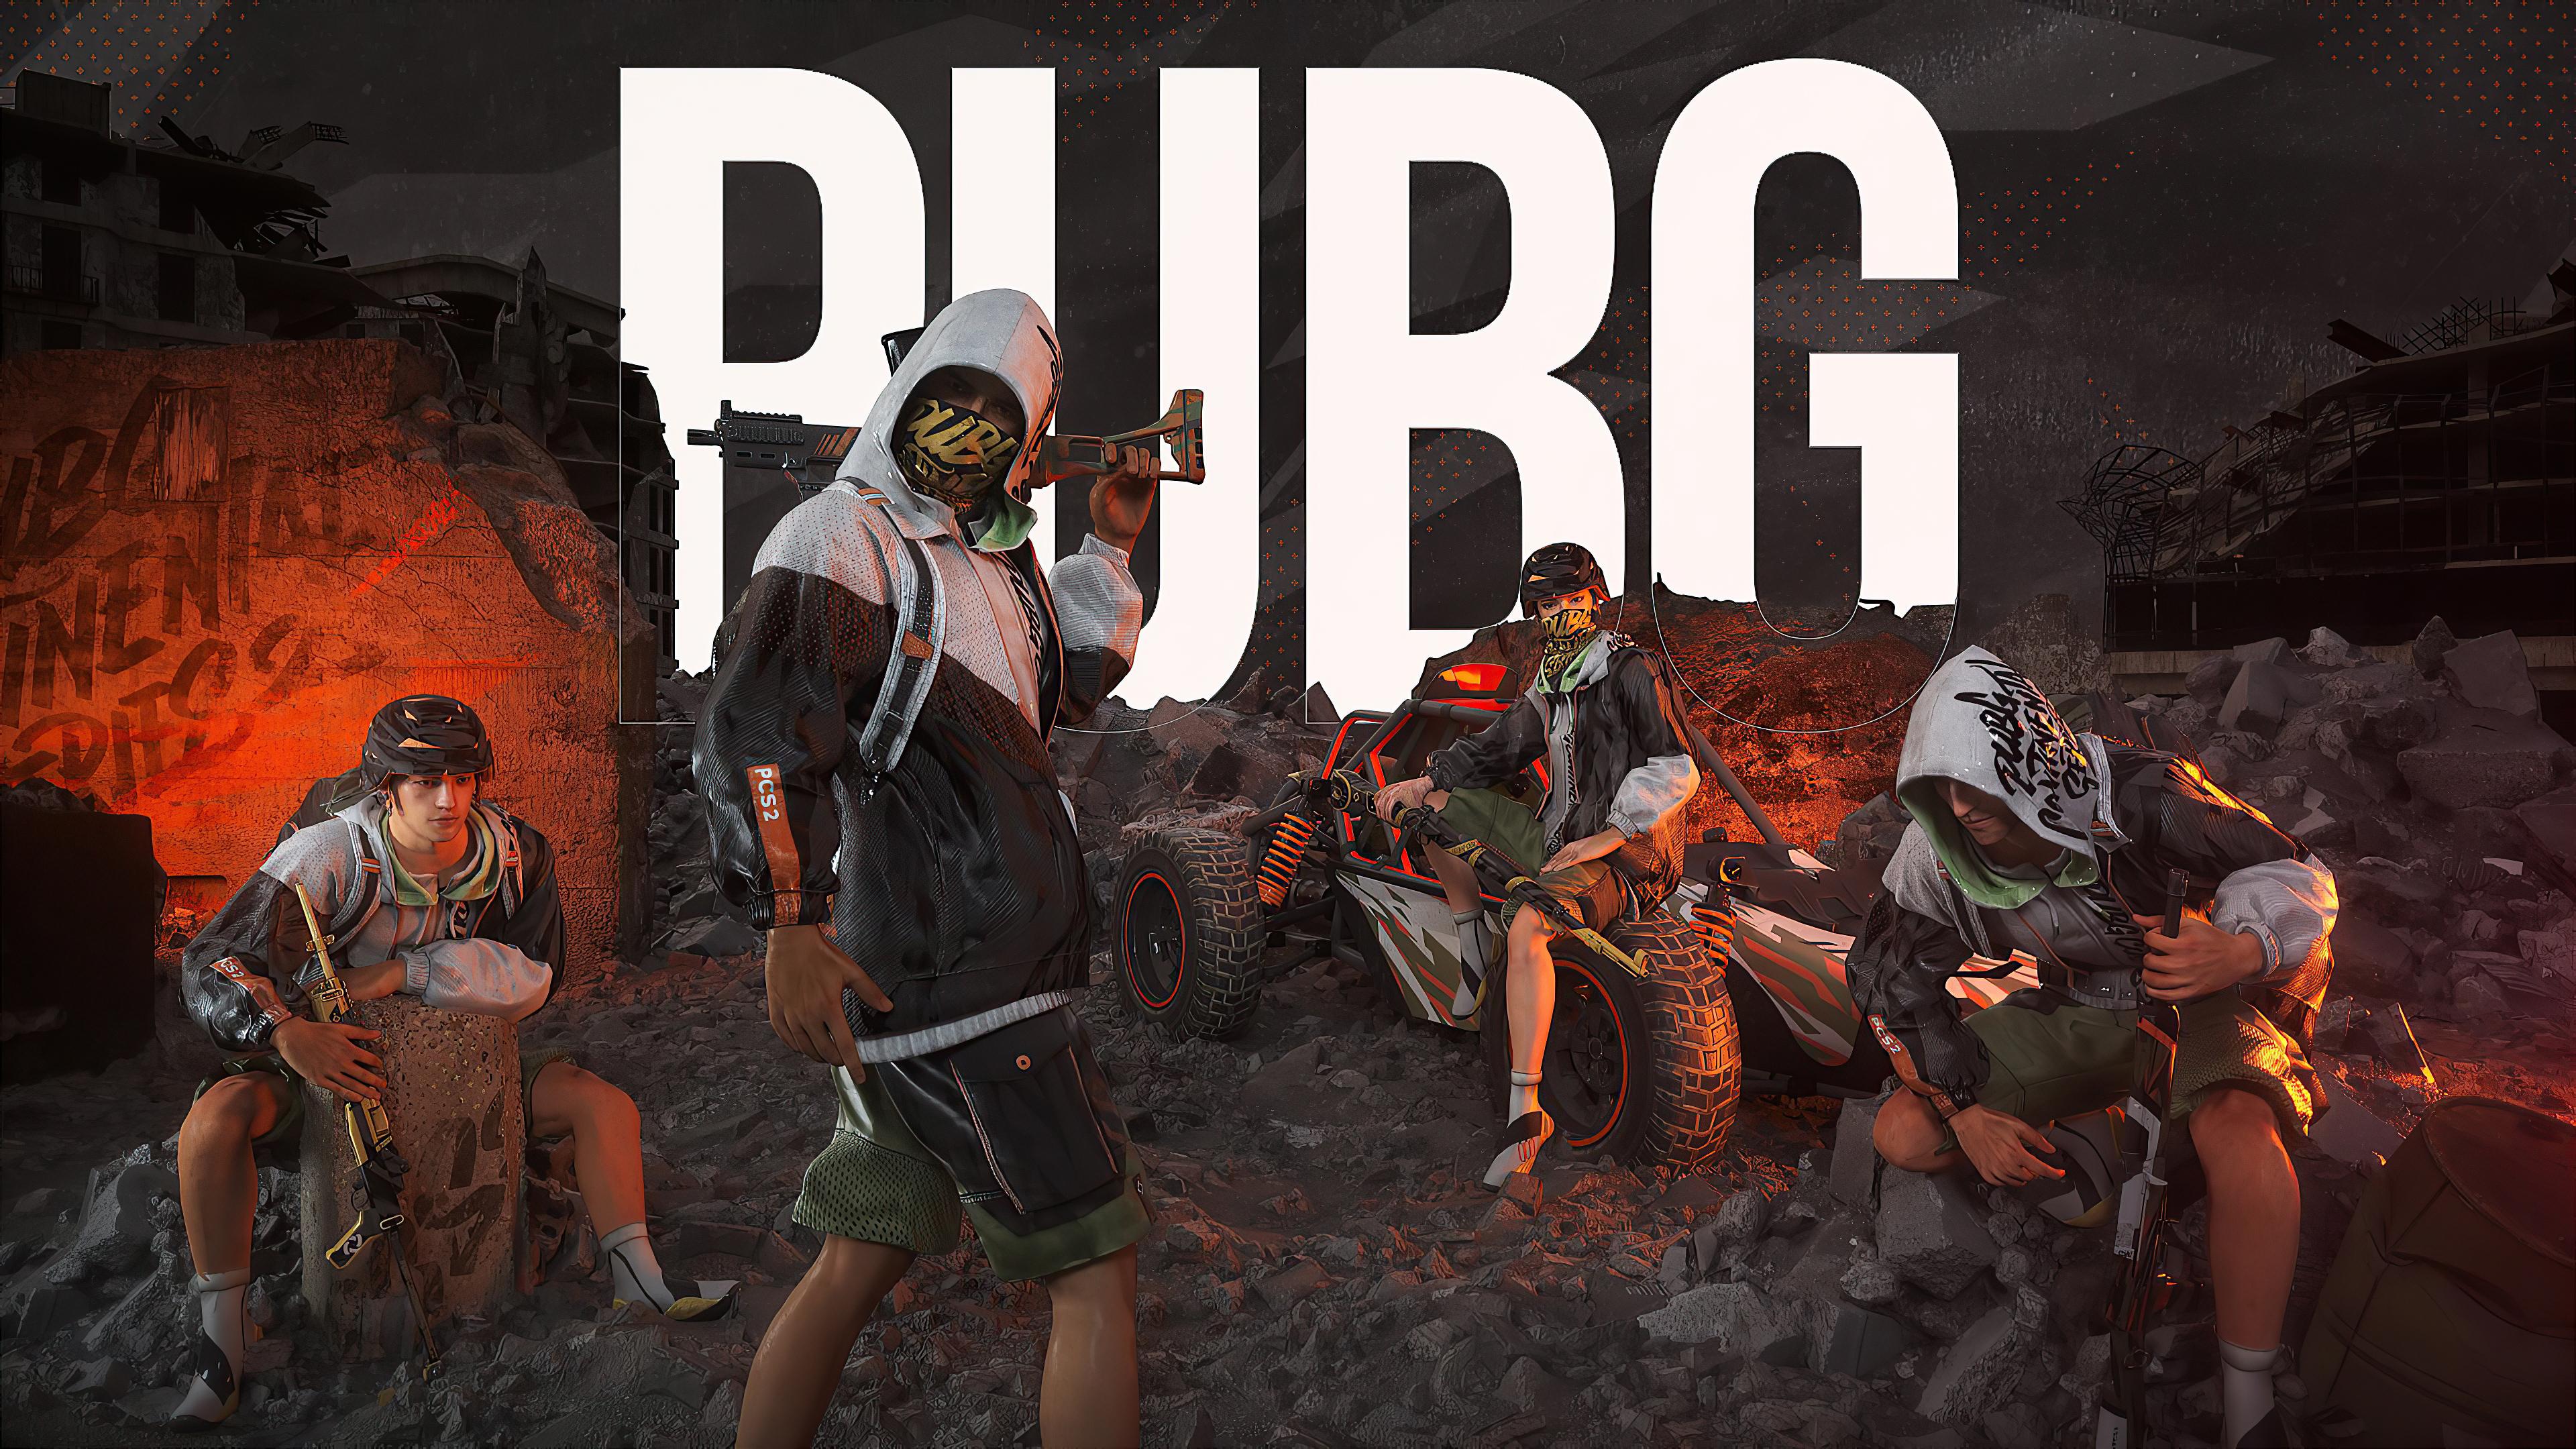 pubg game 2020 coming 4k 1604867300 - Pubg Game 2020 Coming 4k - Pubg Game 2020 Coming 4k wallpapers